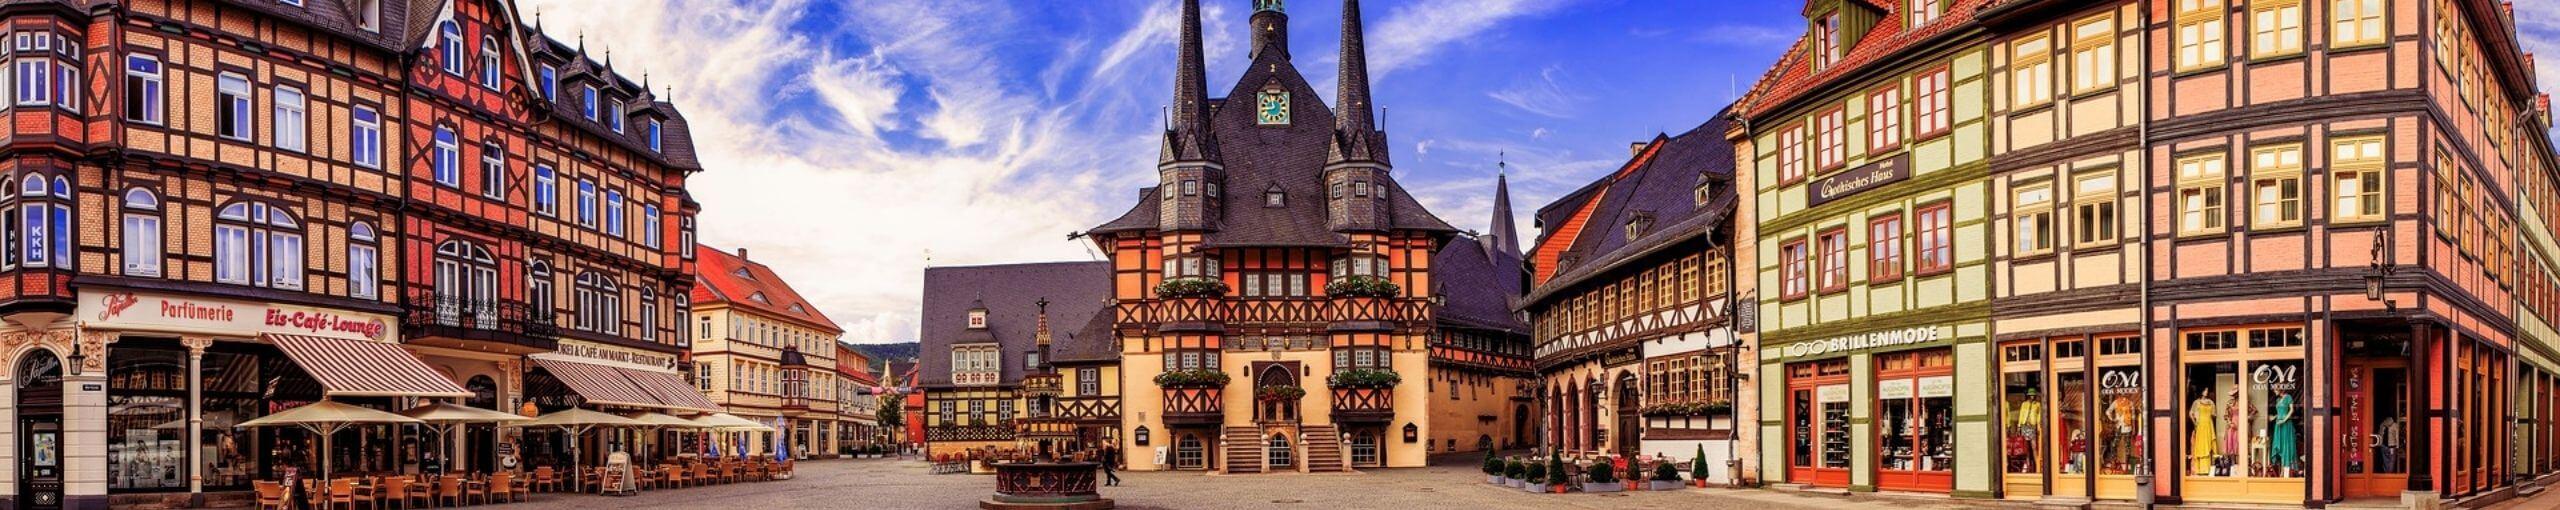 Wernigerode. Distrito de Harz, Sajonia-Anhalt. Alemania.